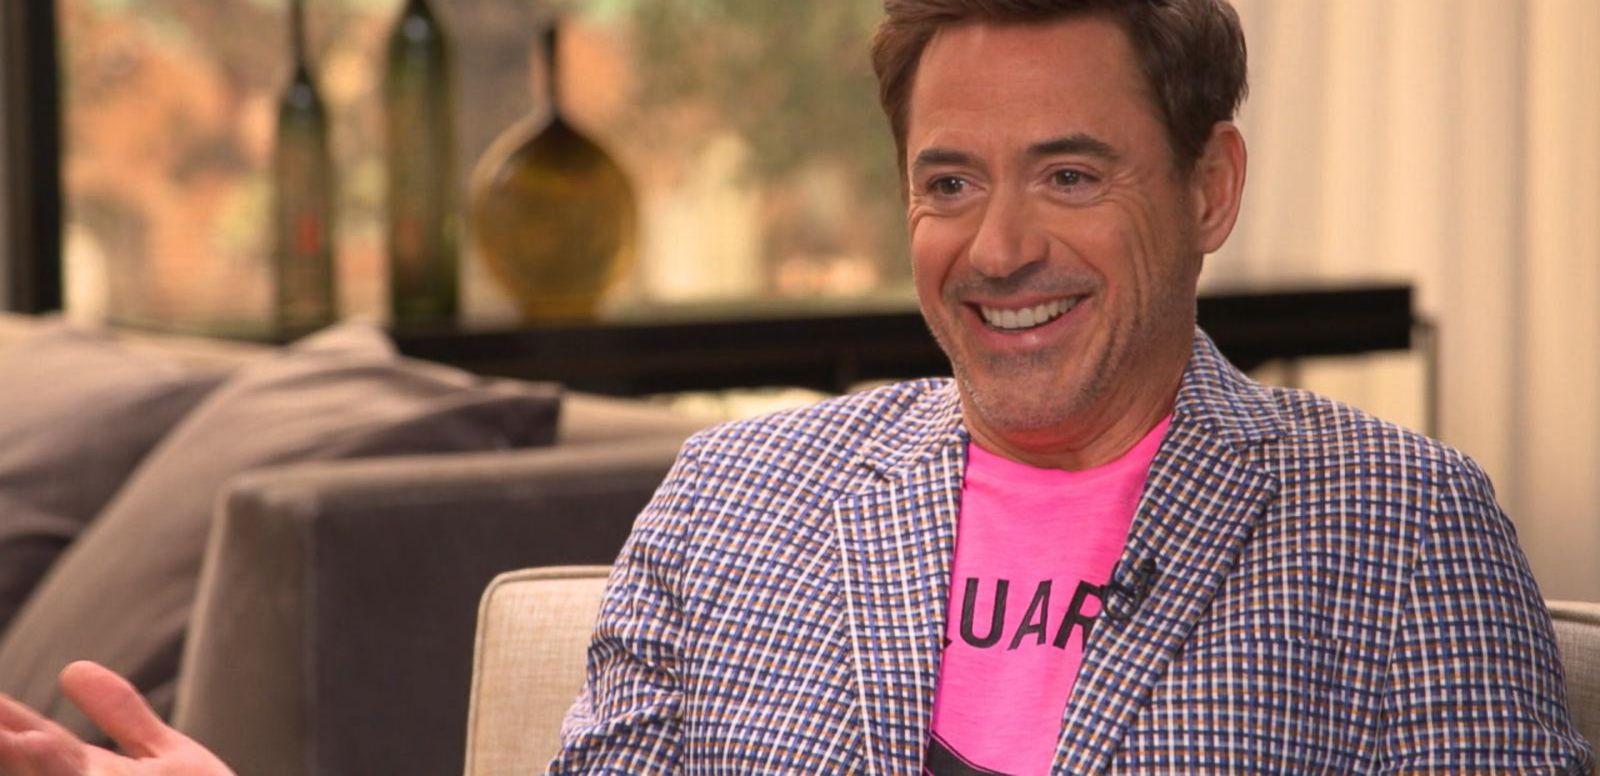 VIDEO: Robert Downey, Jr. Talks Playing Iron Man in Captain America: Civil War